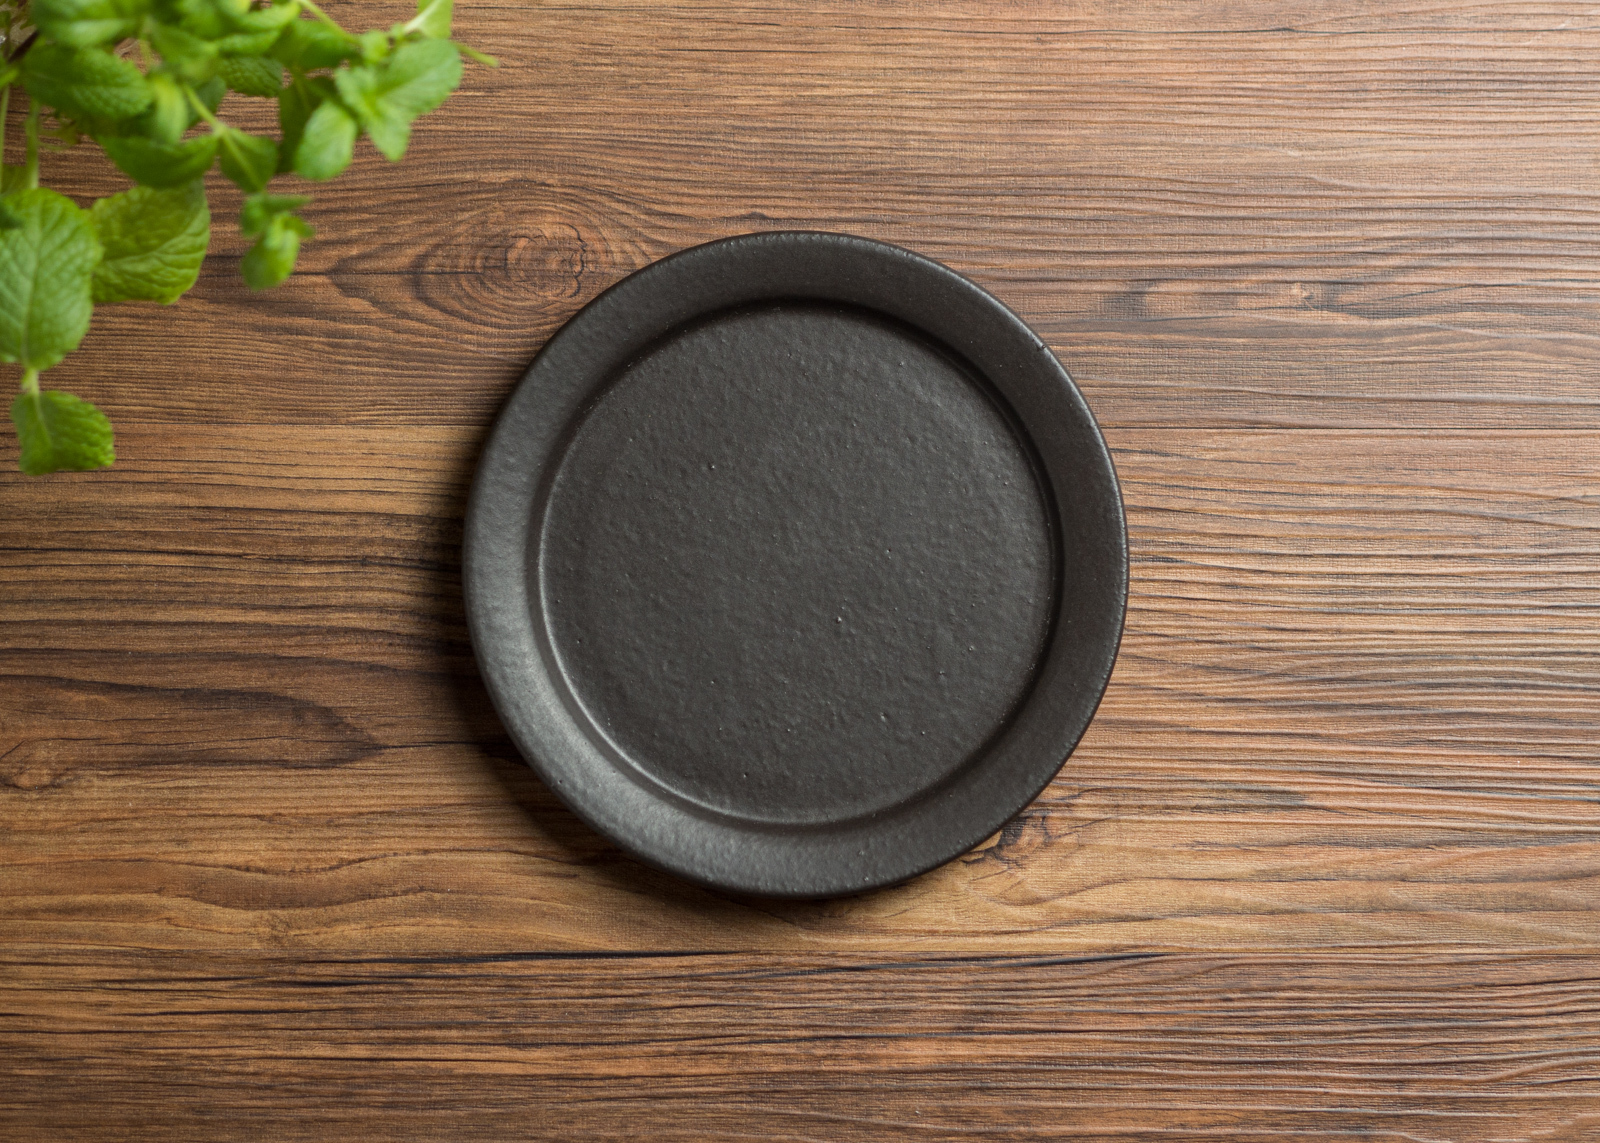 SHIROUMA 洋皿 18cm 黒(中皿・パンプレート・デザート皿)/長谷川 哲也